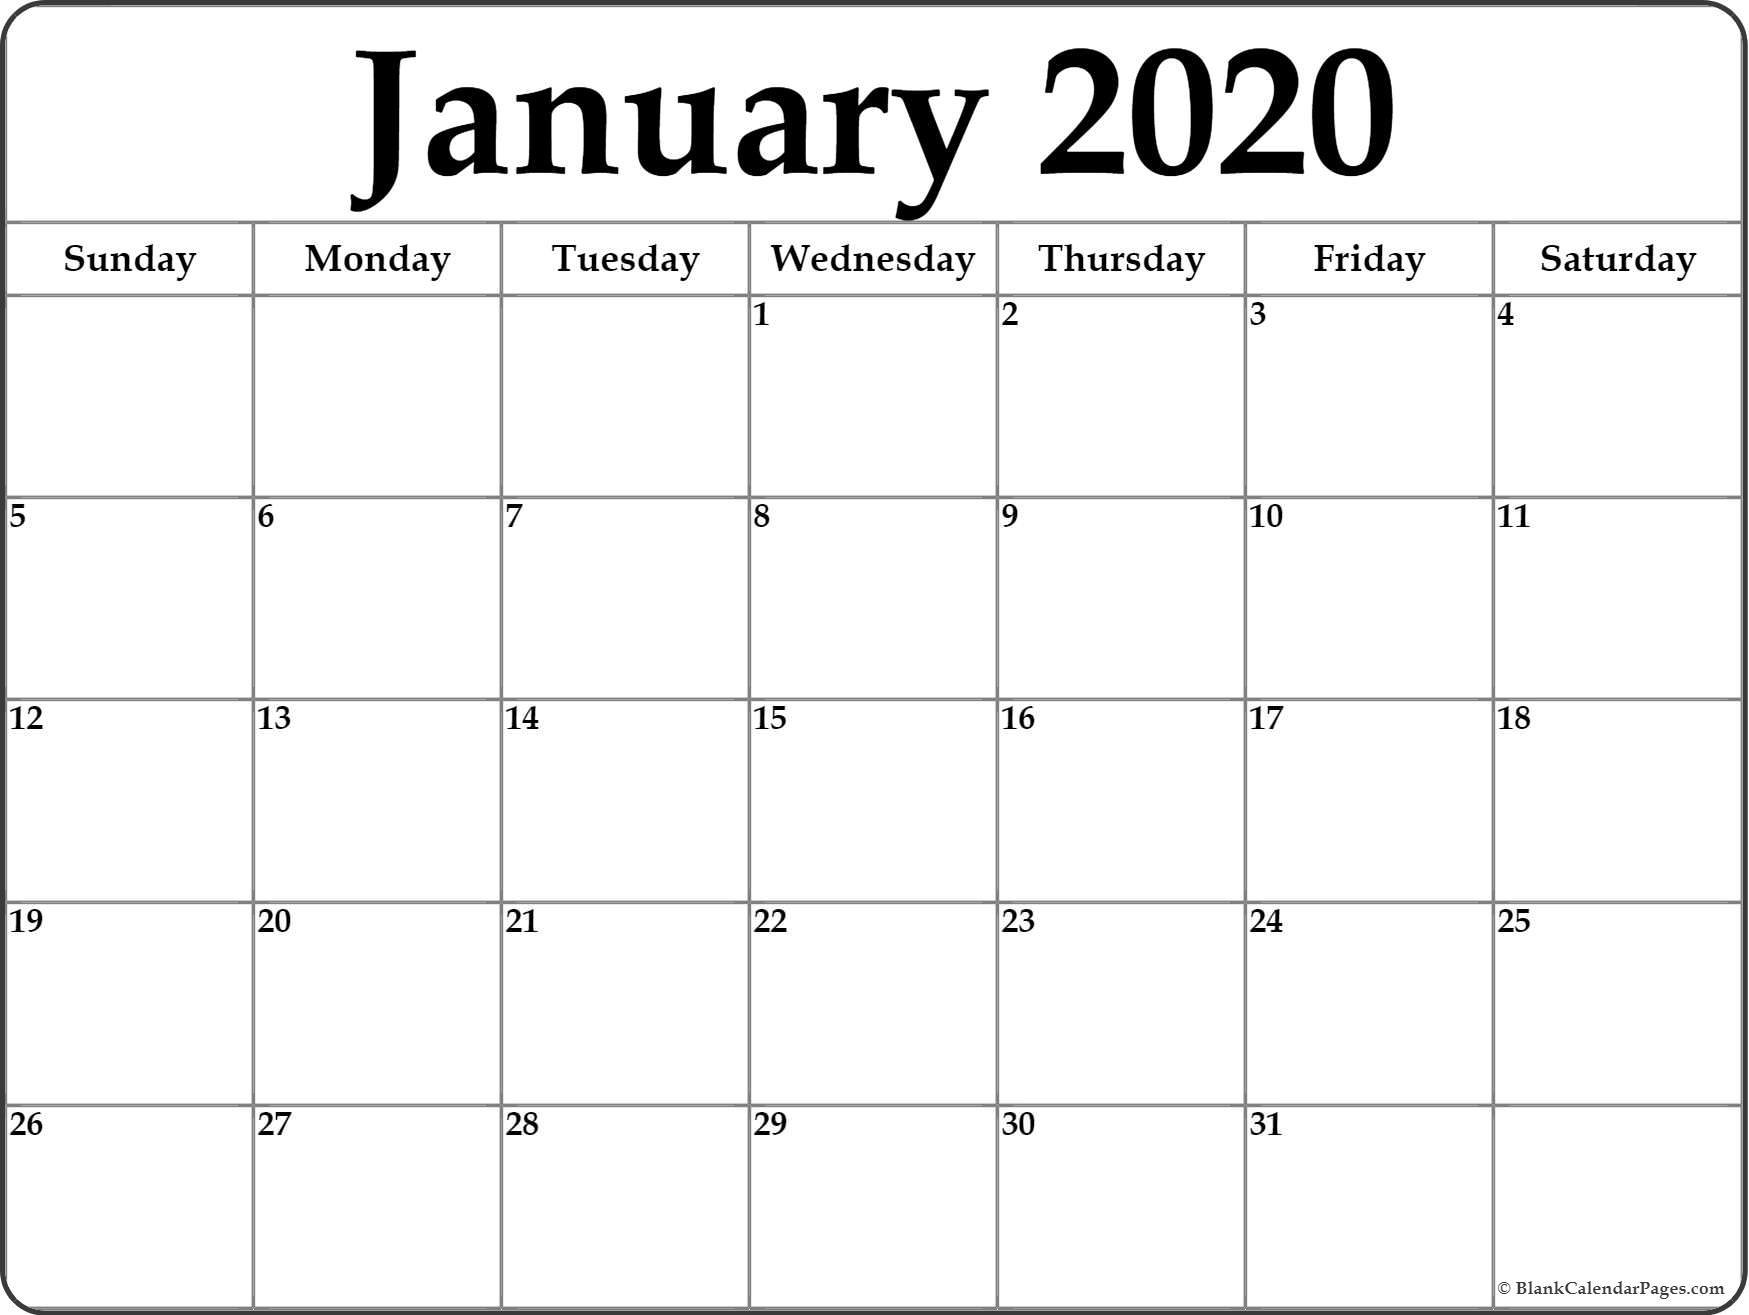 2020 Calendar Monthly Printable January 2020 Blank Calendar Collection